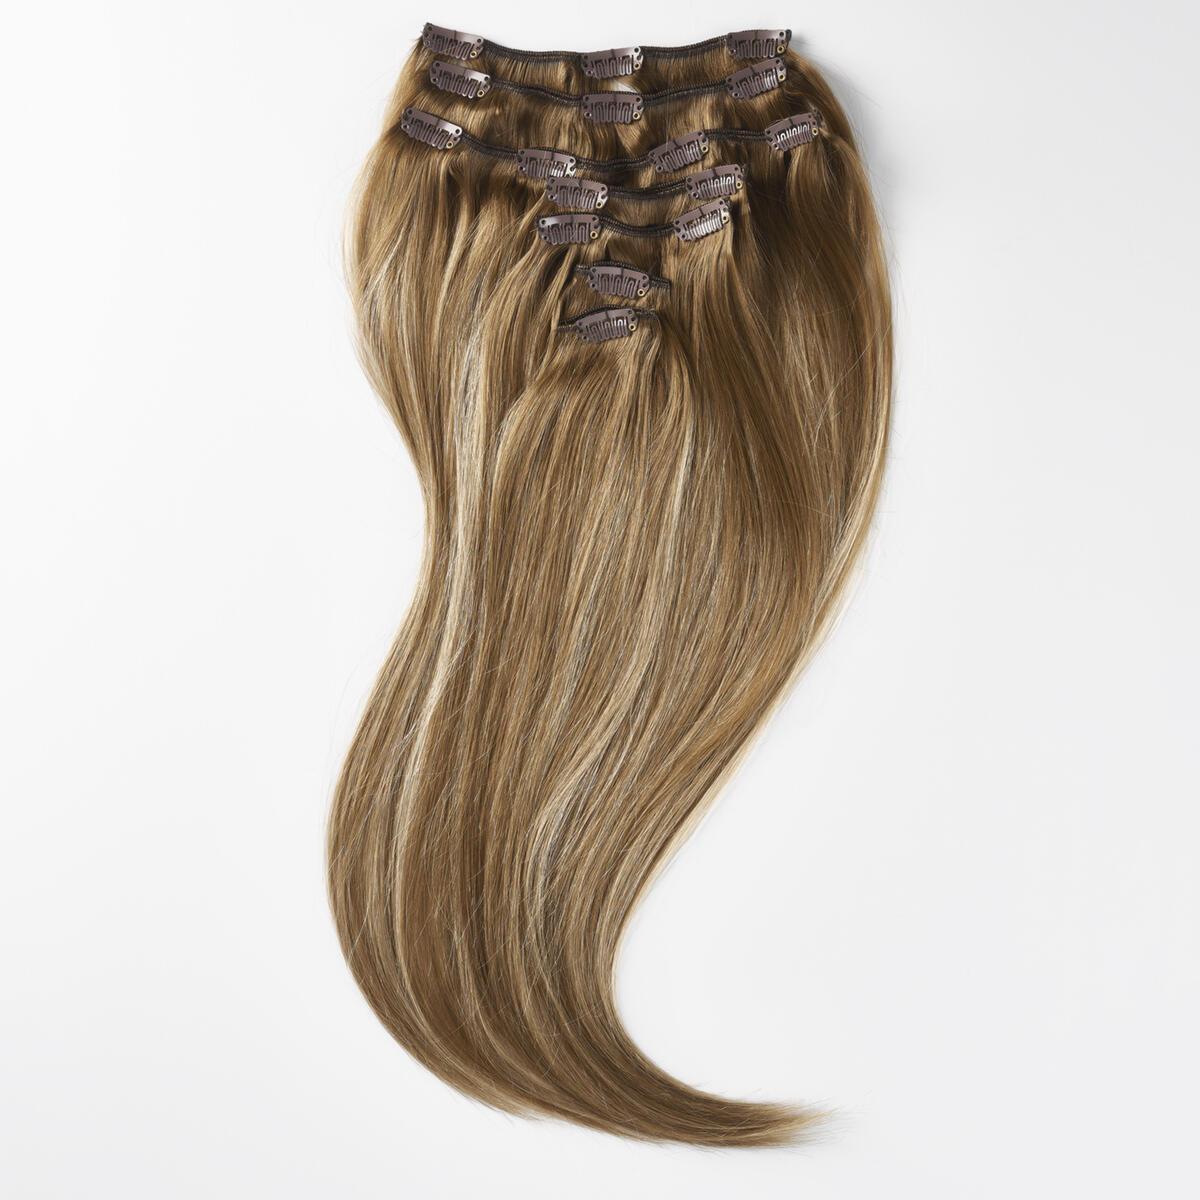 Clip-on set B5.0/8.3 Brownish Blonde Balayage 50 cm